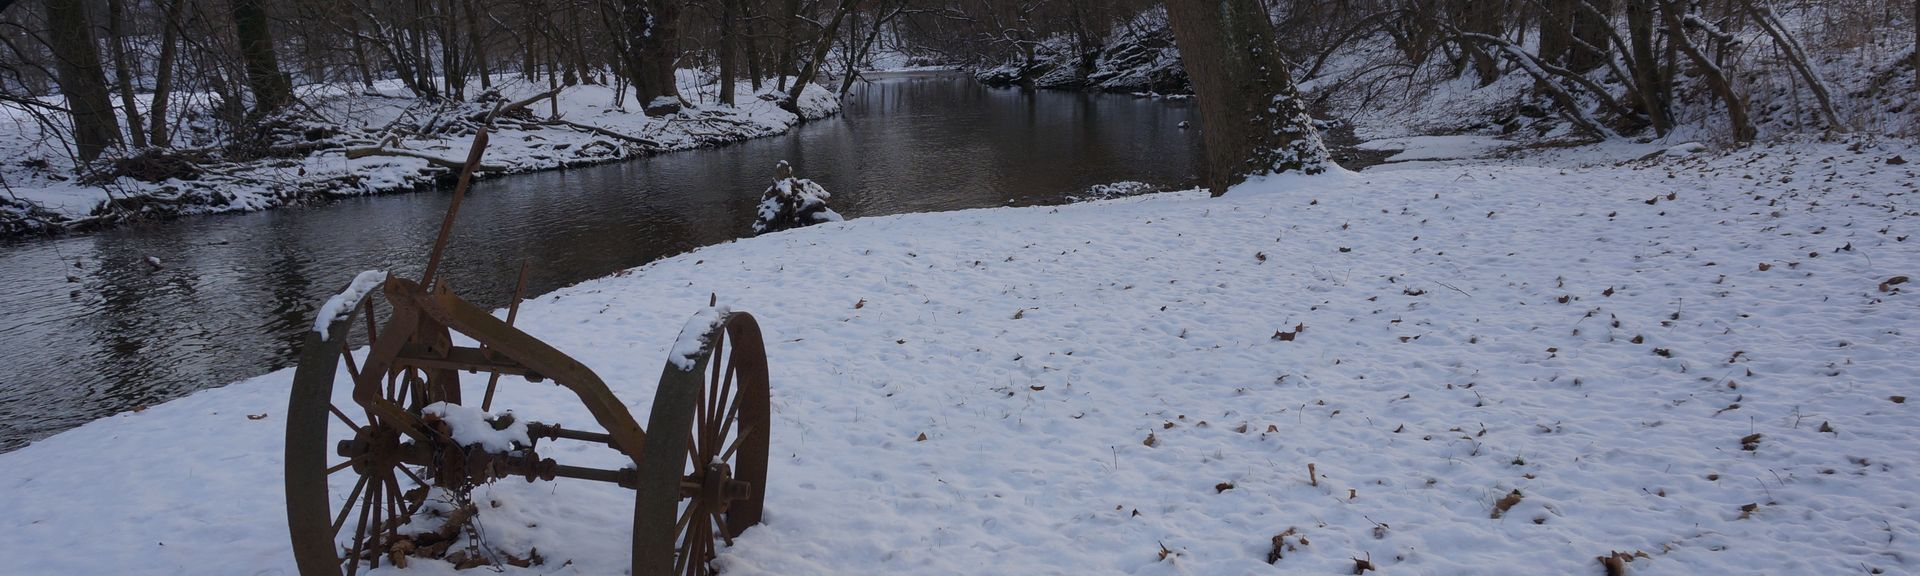 Koziar's Christmas Village, Bernville, PA, USA